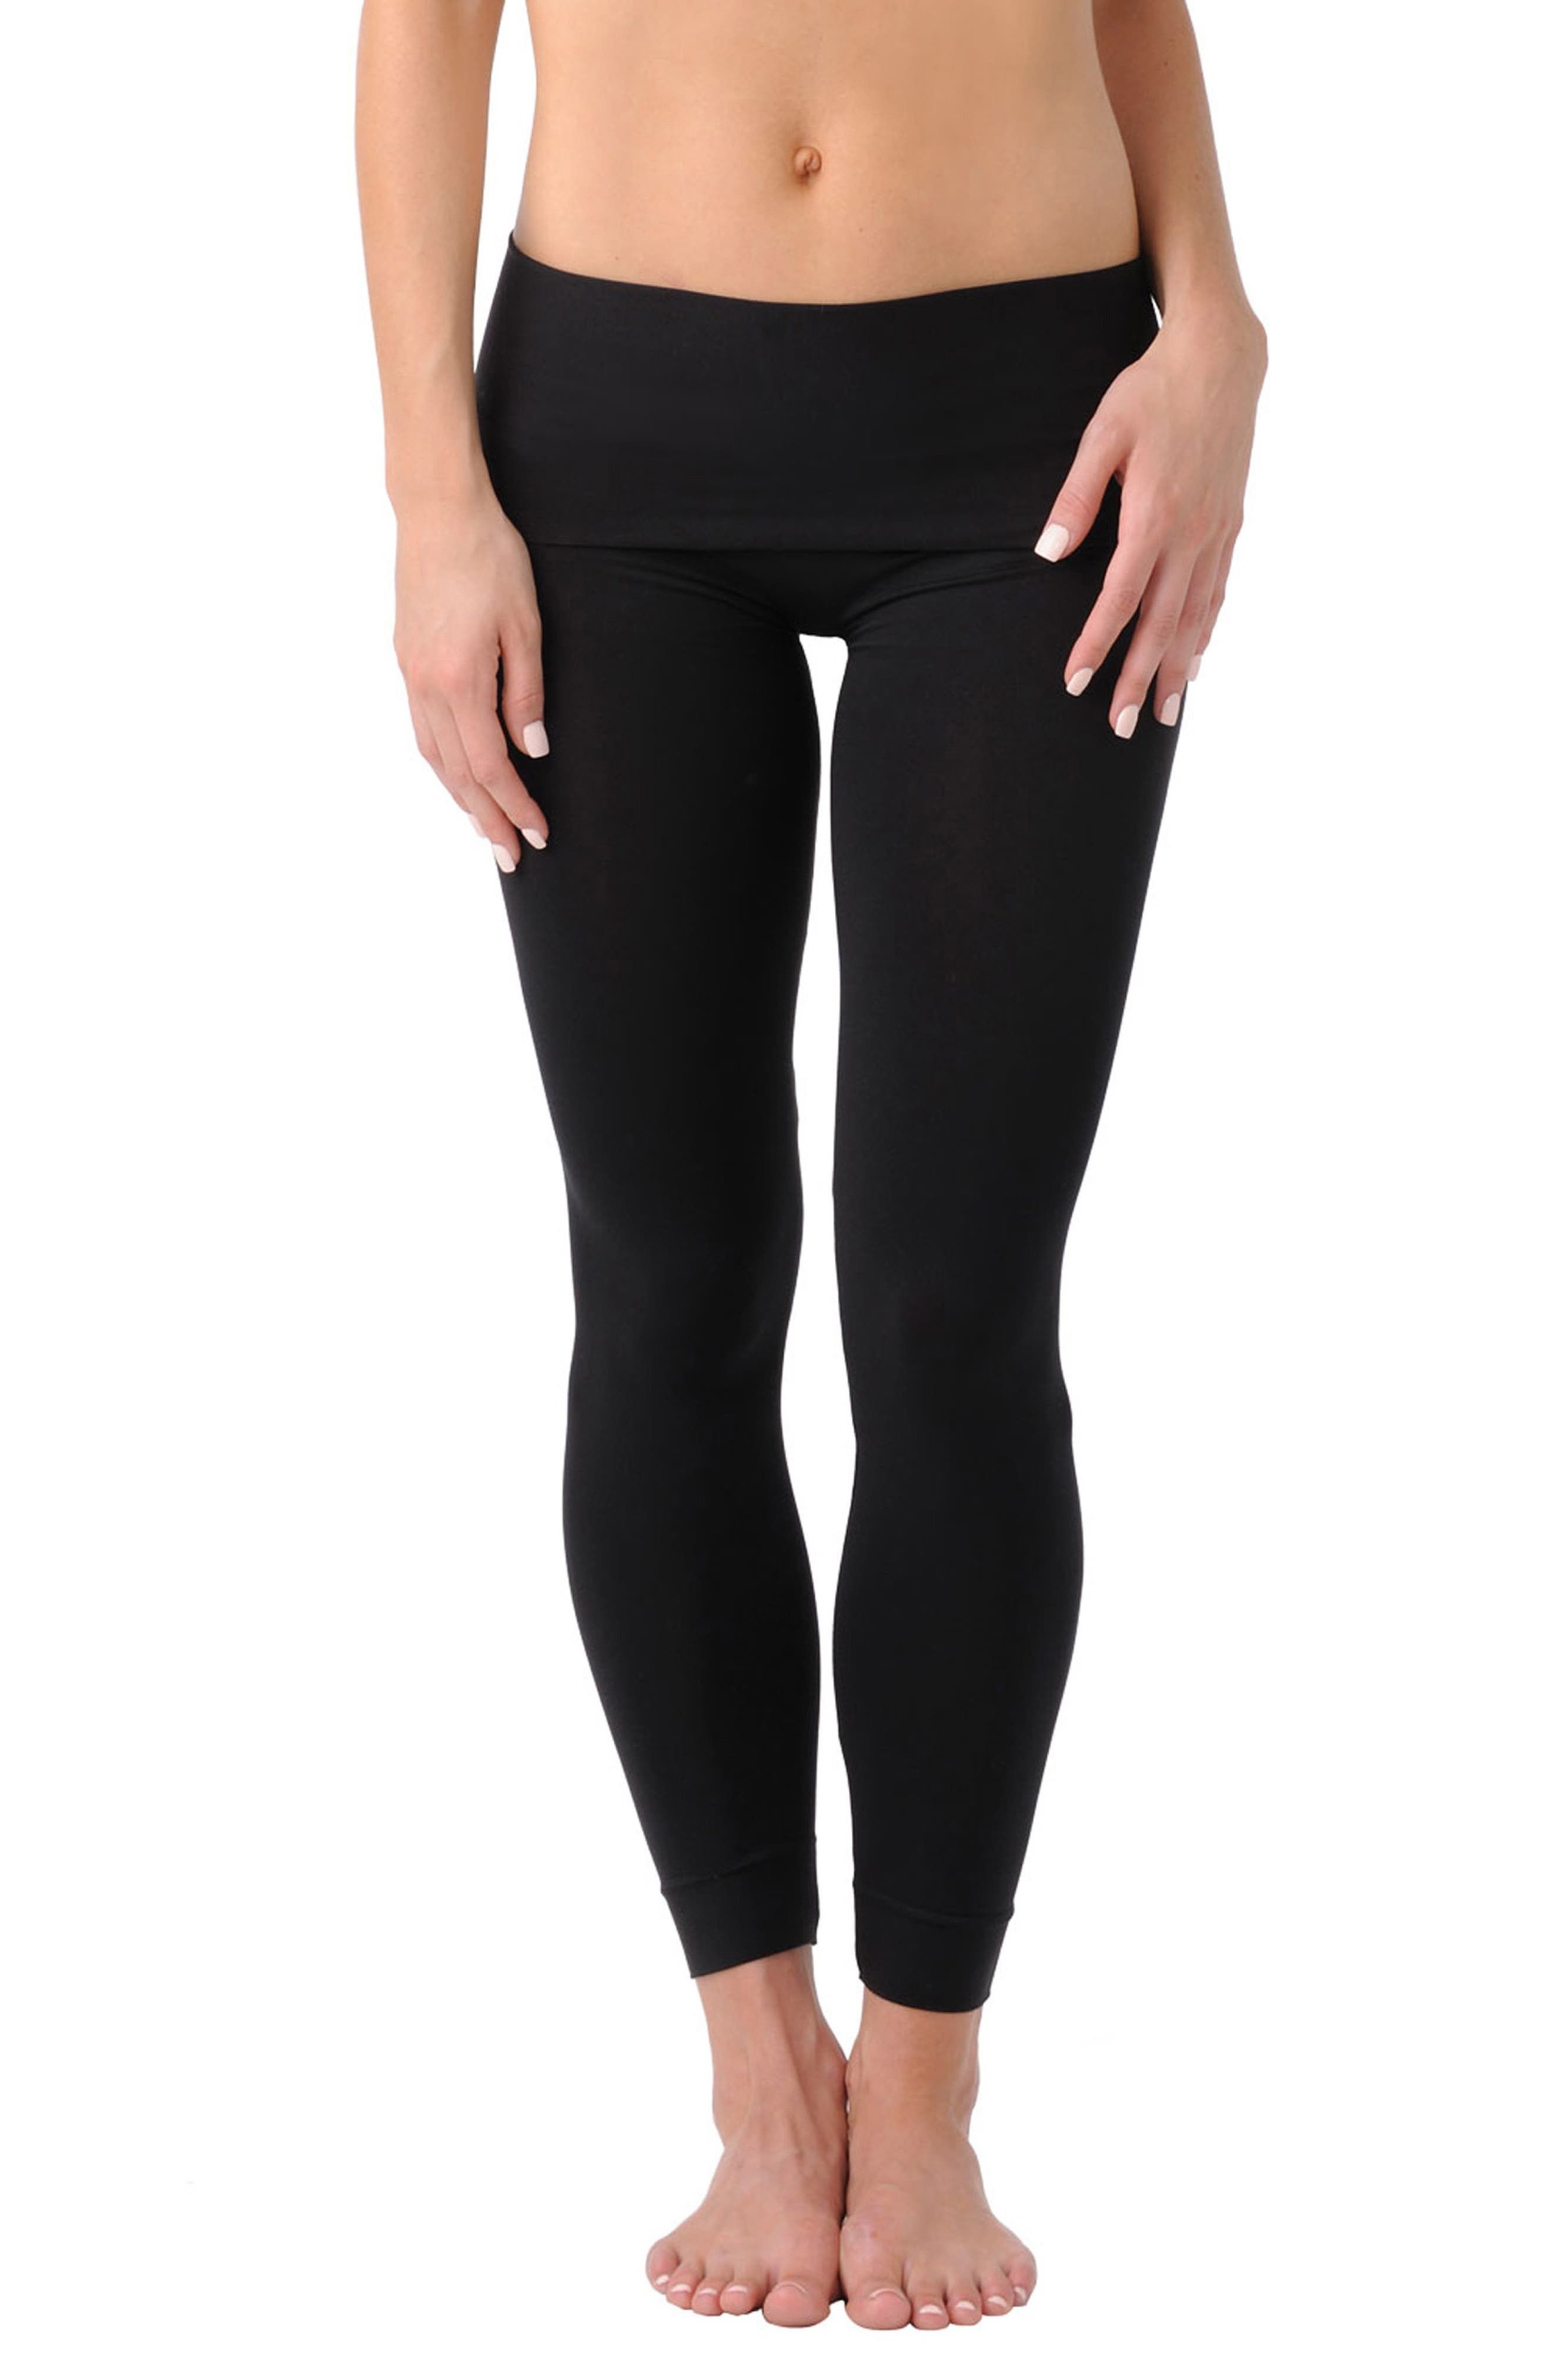 Women's Belly Bandit B.d.a.(TM) Stretch Knit Leggings